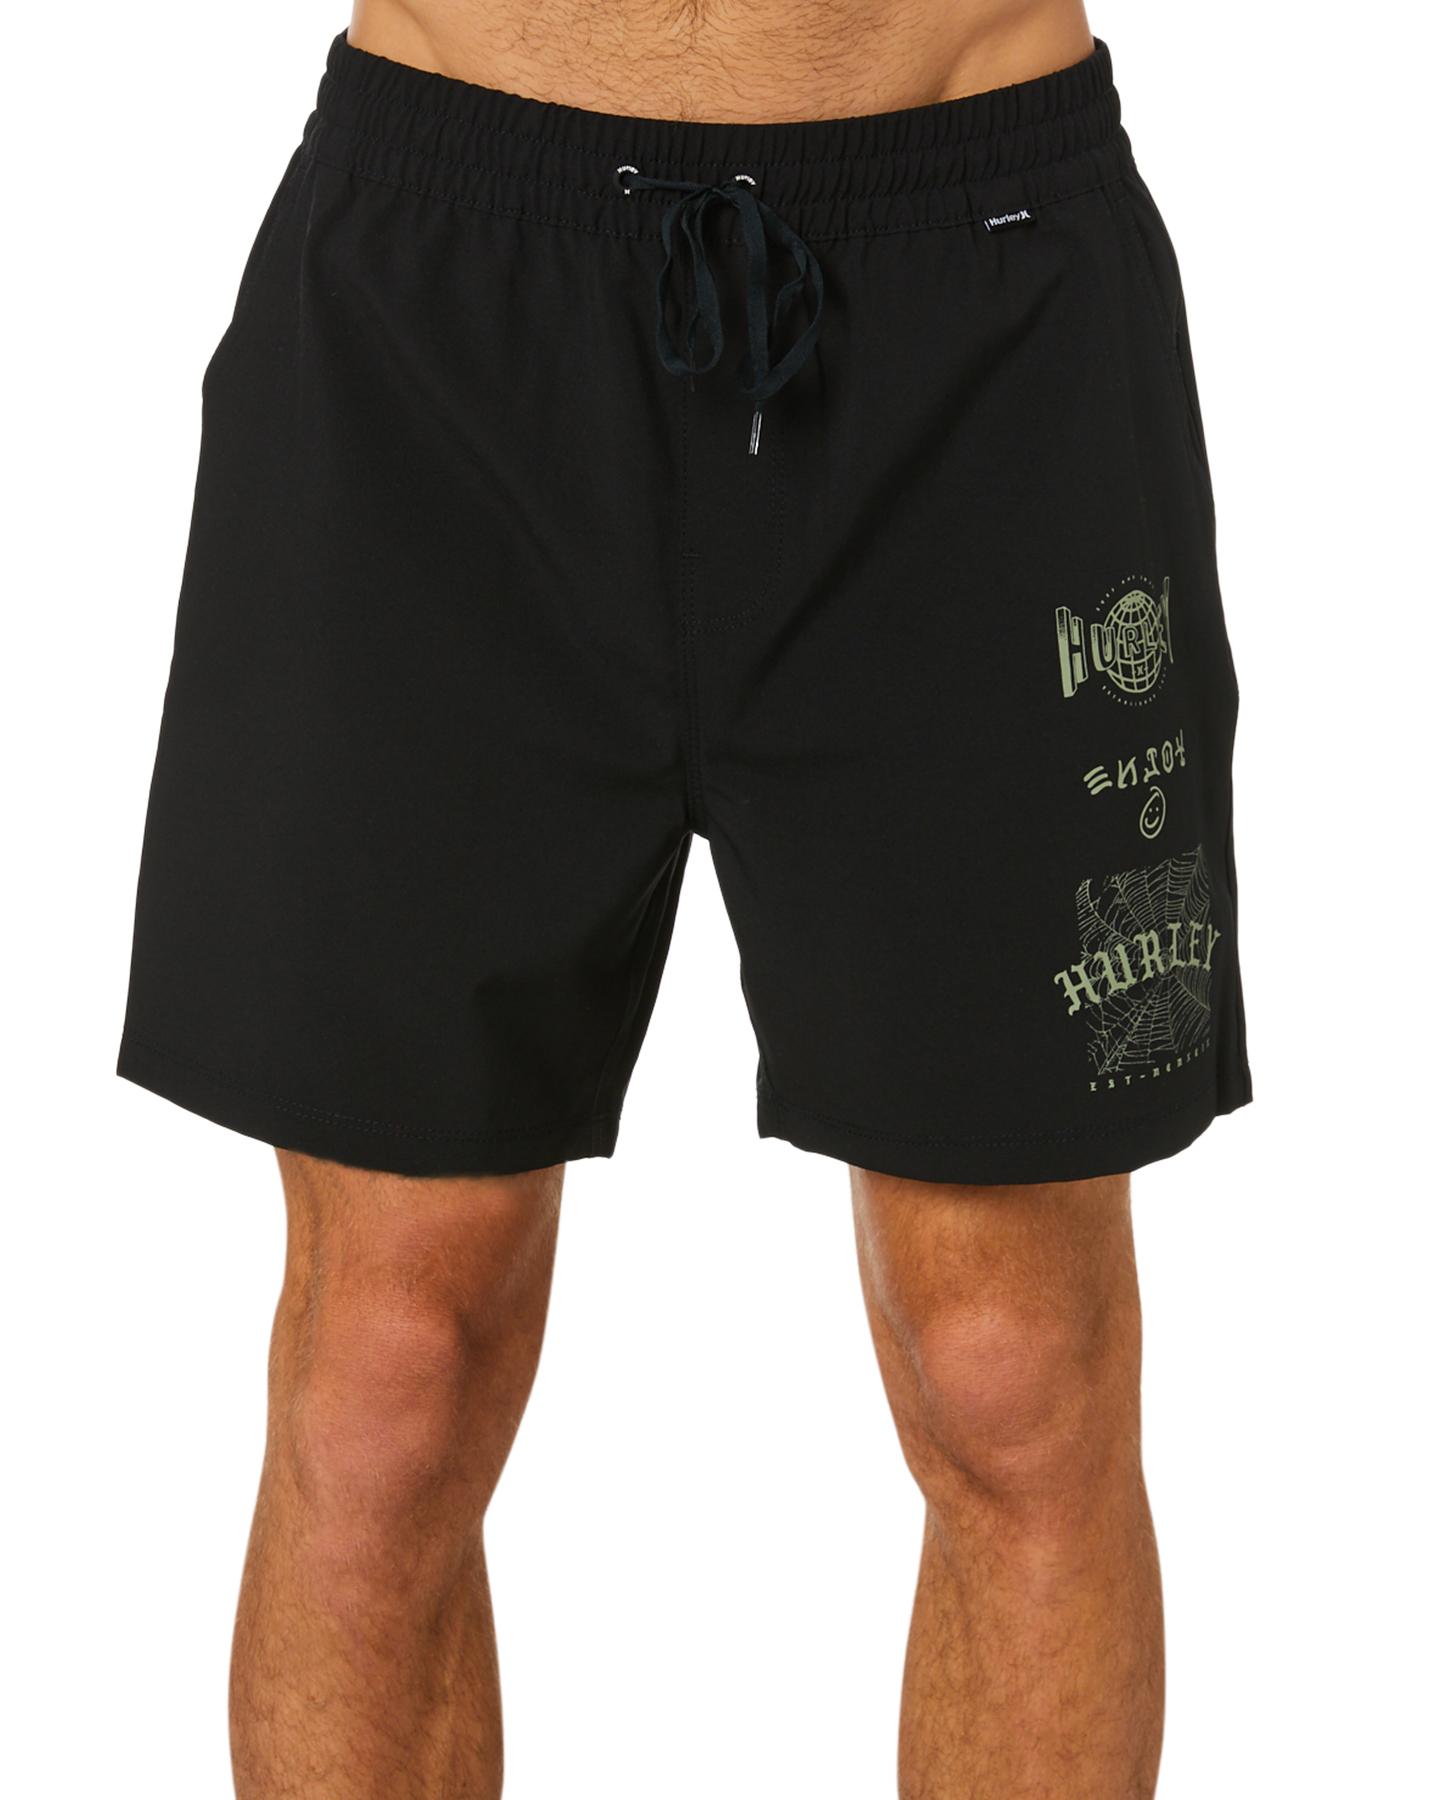 Hurley Freshwater Volley Mens 17In Boardshort Black